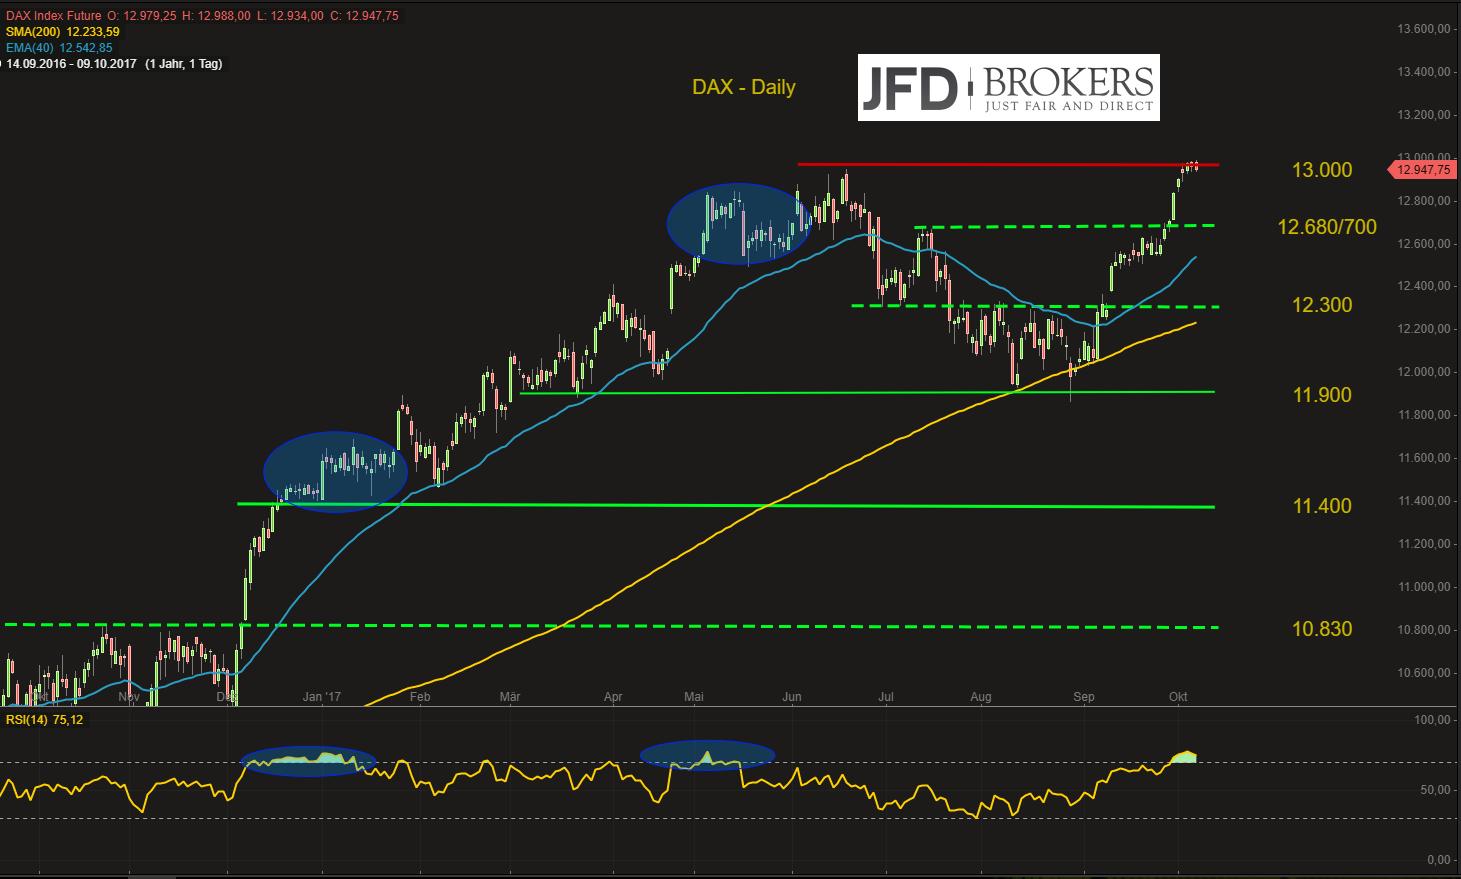 DAX-packt-die-13-000er-Hürde-einfach-nicht-Kommentar-JFD-Brokers-GodmodeTrader.de-2